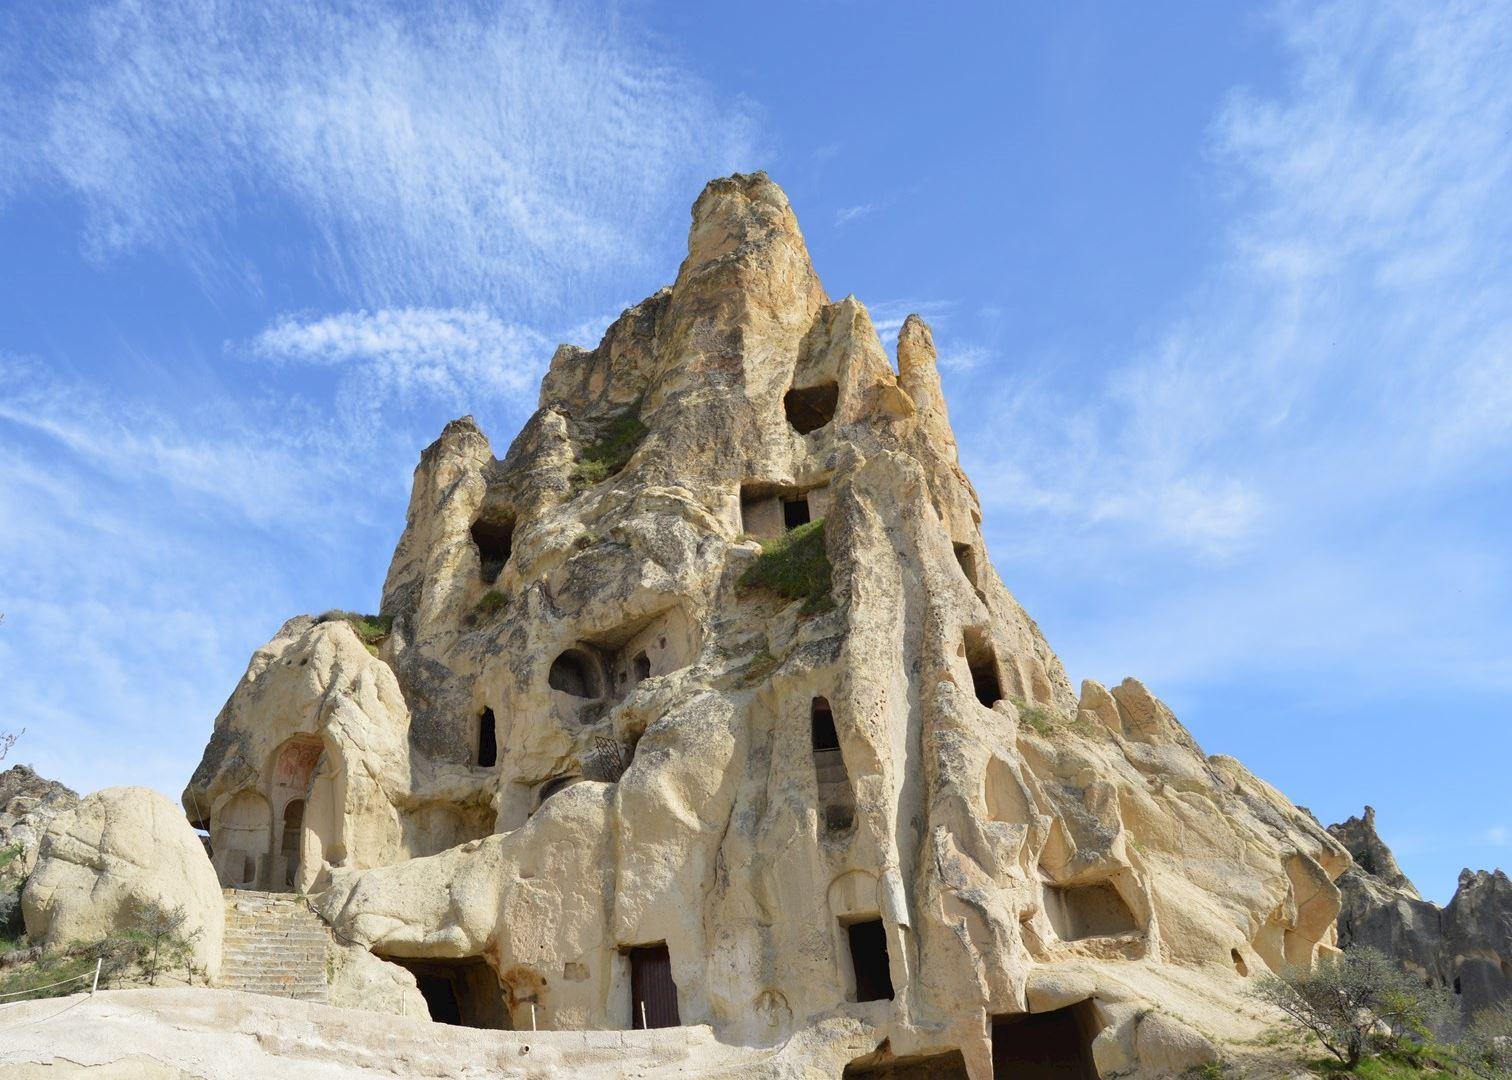 Trip to Göreme Open Air Museum, Turkey  Audley Travel